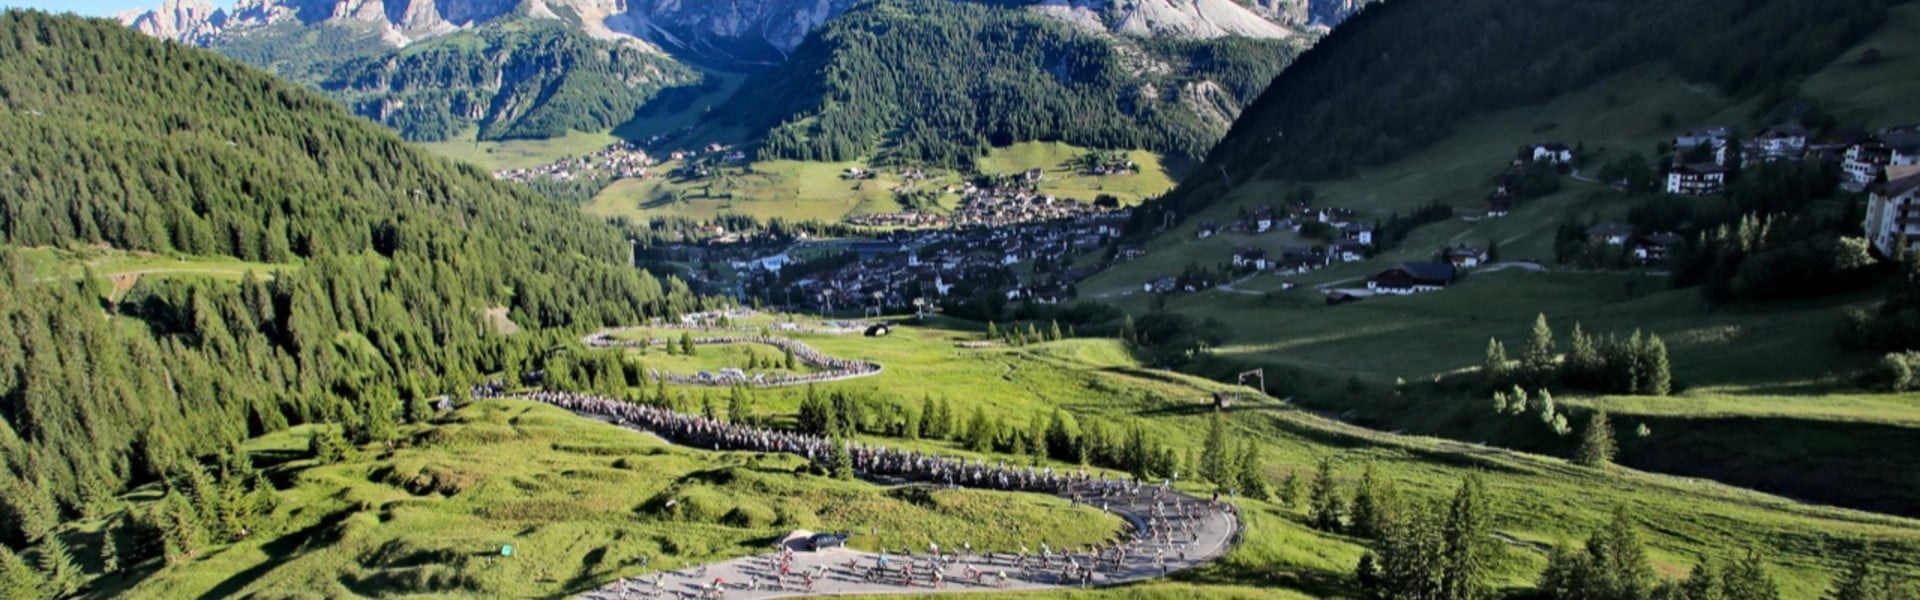 Maratona dles Dolomite